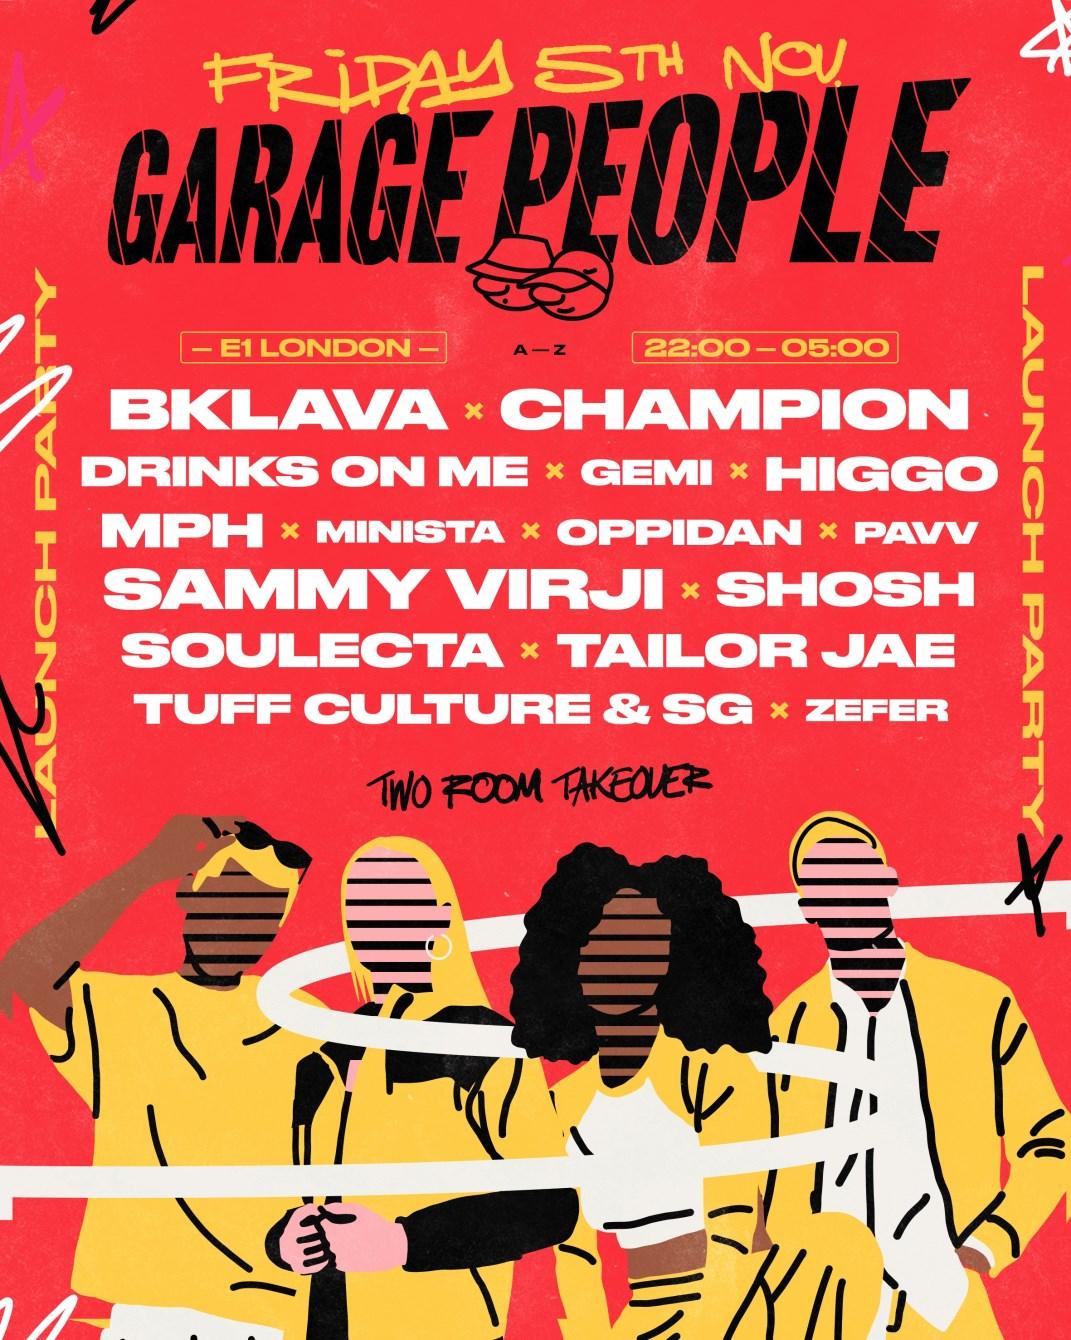 Garage People - Flyer front